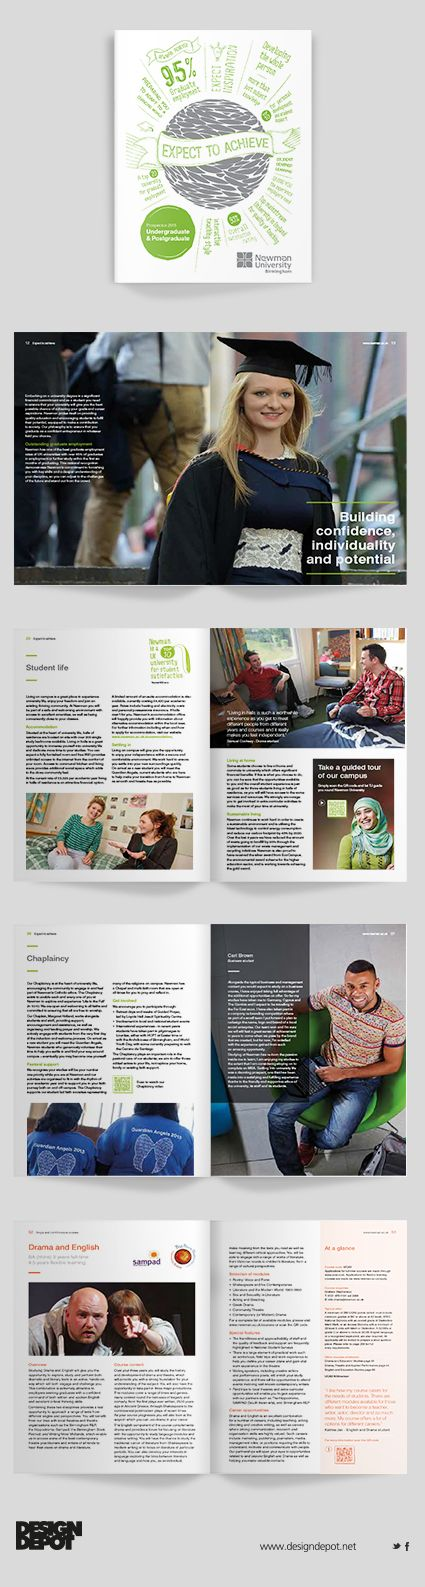 Newman University prospectus, artwork, Birmingham, university, identity, branding, design depot, prospectus, education, graphics, Northamptonshire #DesignDepotuk